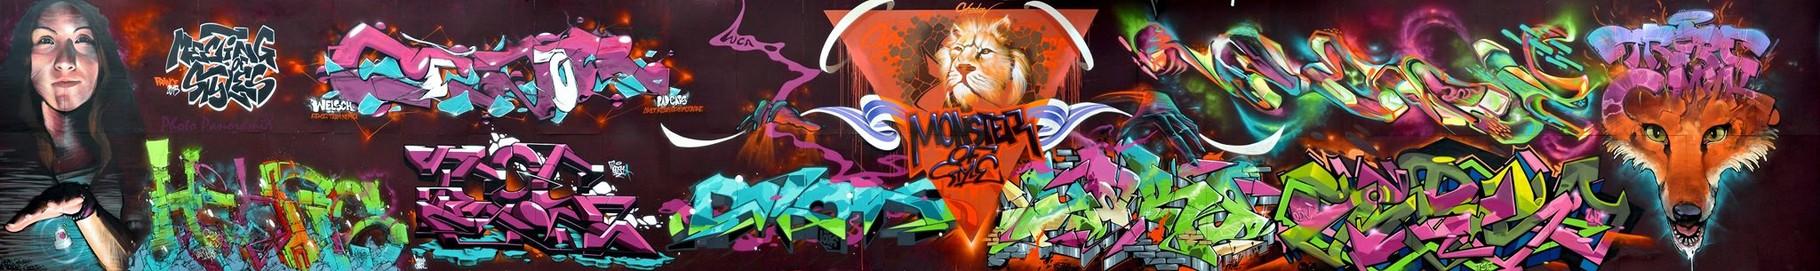 Meeting Of Style (Main wall) ) JEAN ROOBLE X CESAR X SHURER X TEOS X PABLO X MUTHA X SHADOW X YAKO X GERSO X ? X TRETZE - Perpignan (2015) ©Panoramix